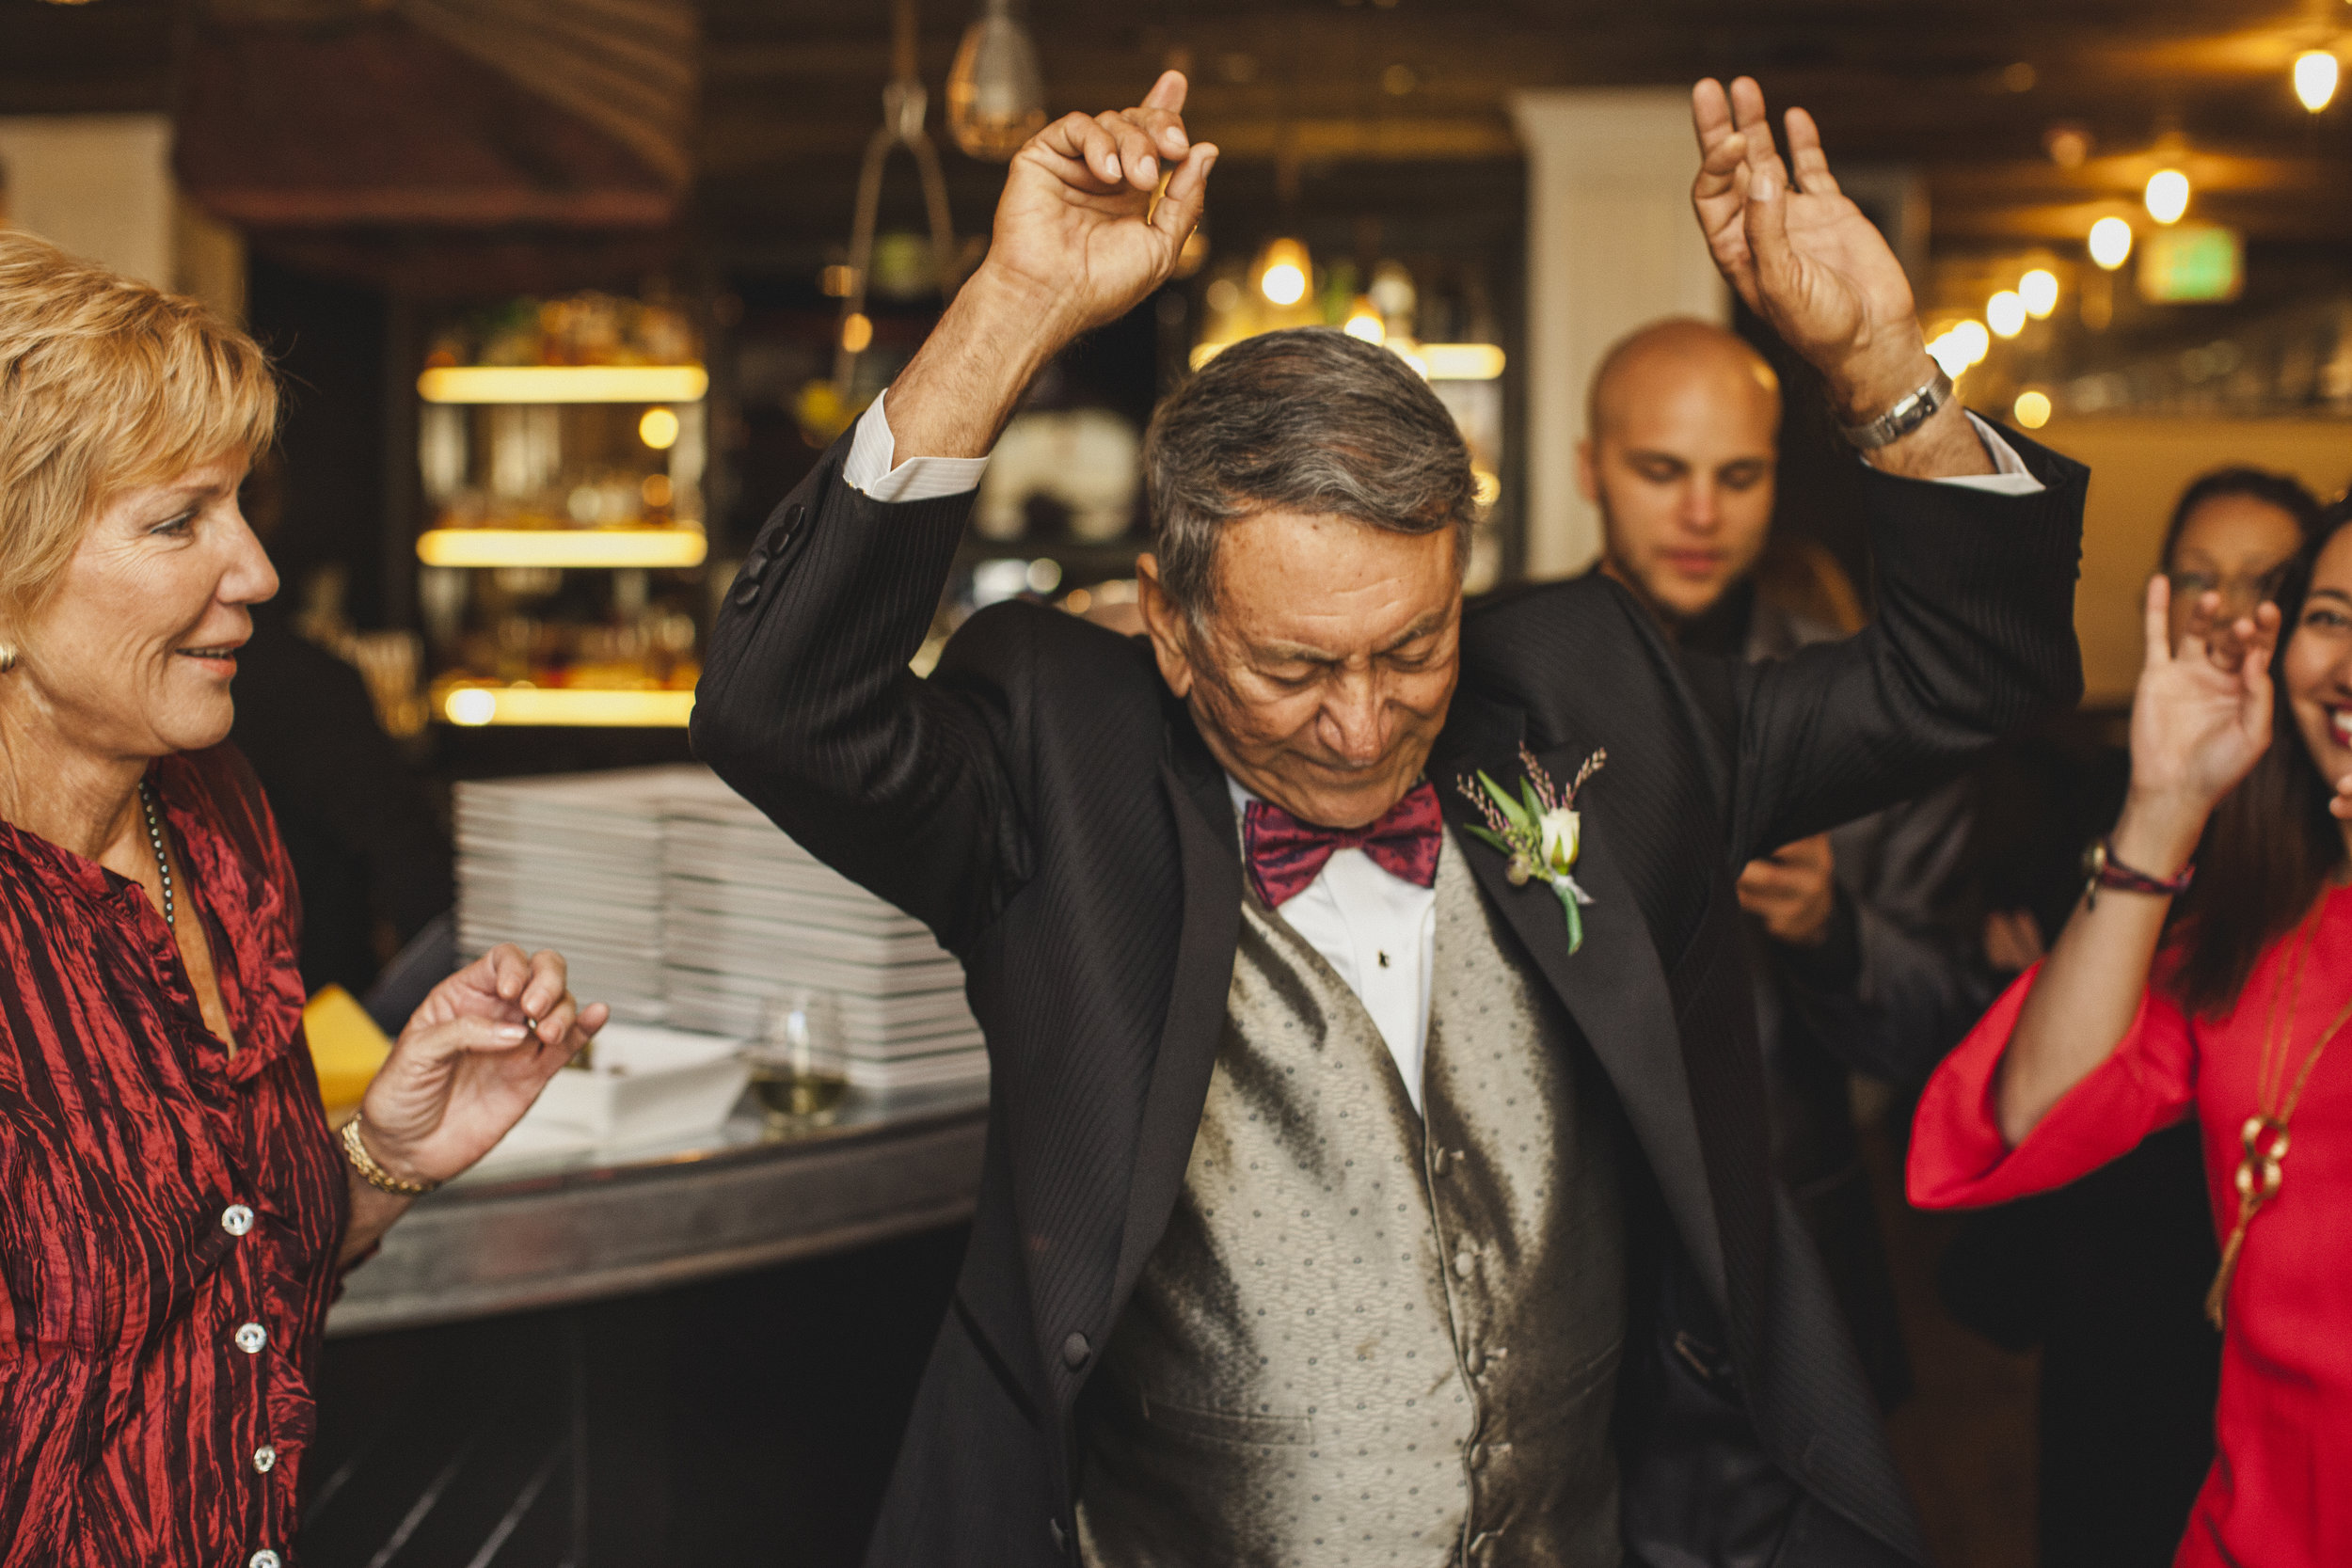 NE-LeahandAshtonphotography-Telluride-Wedding-Photography-7292.jpg